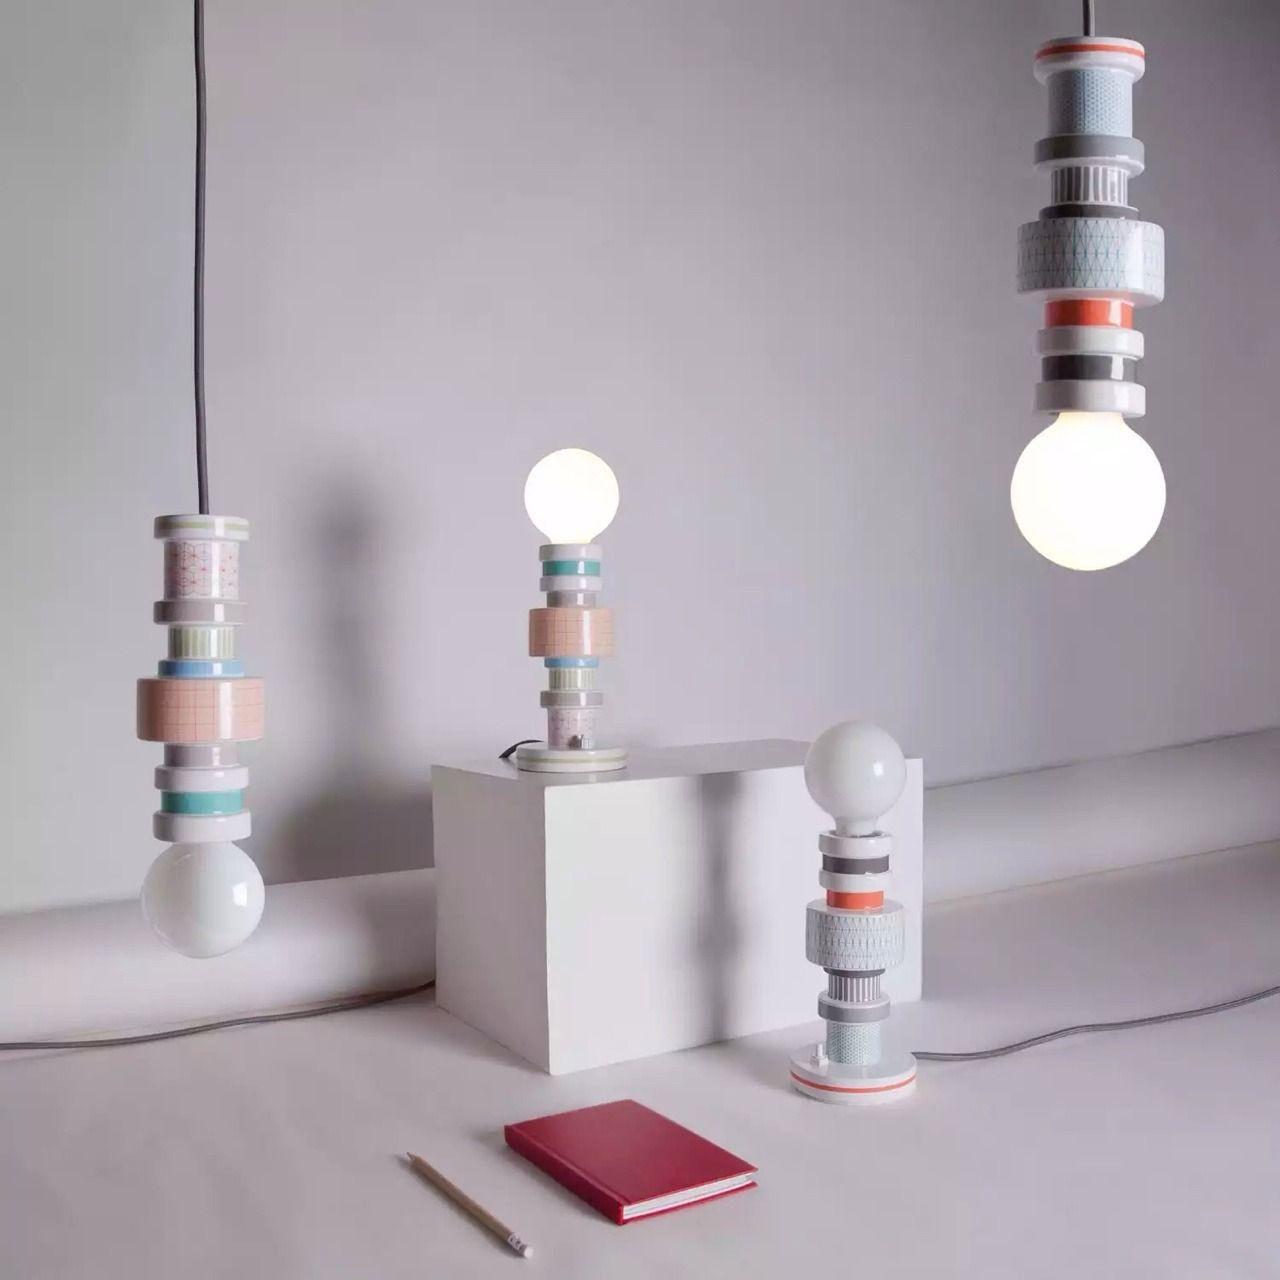 Alessandro zambelli for seletti lamp ceiling lamp